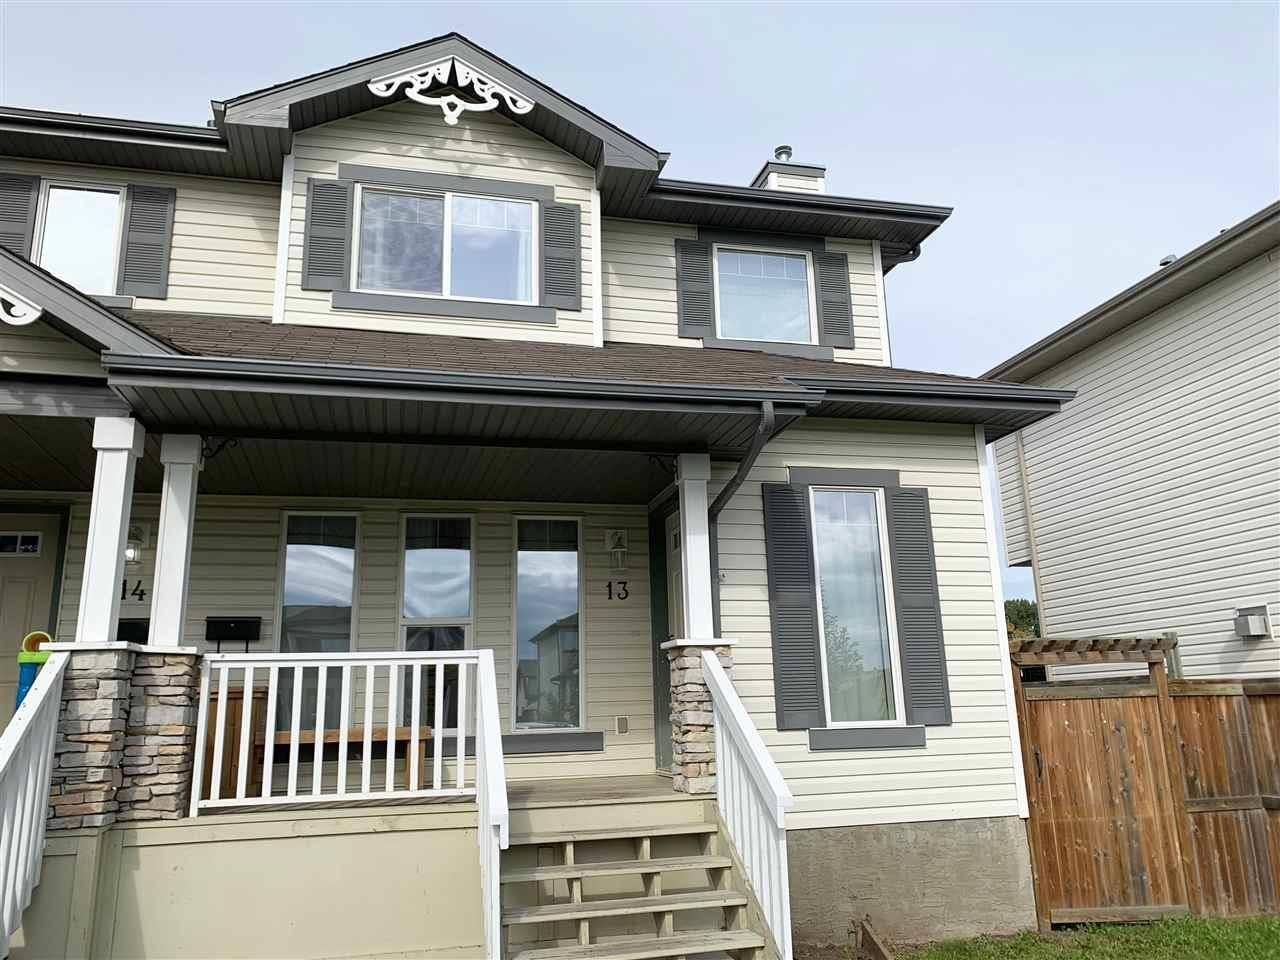 Townhouse for sale at 13 Southwick Pt Leduc Alberta - MLS: E4184963